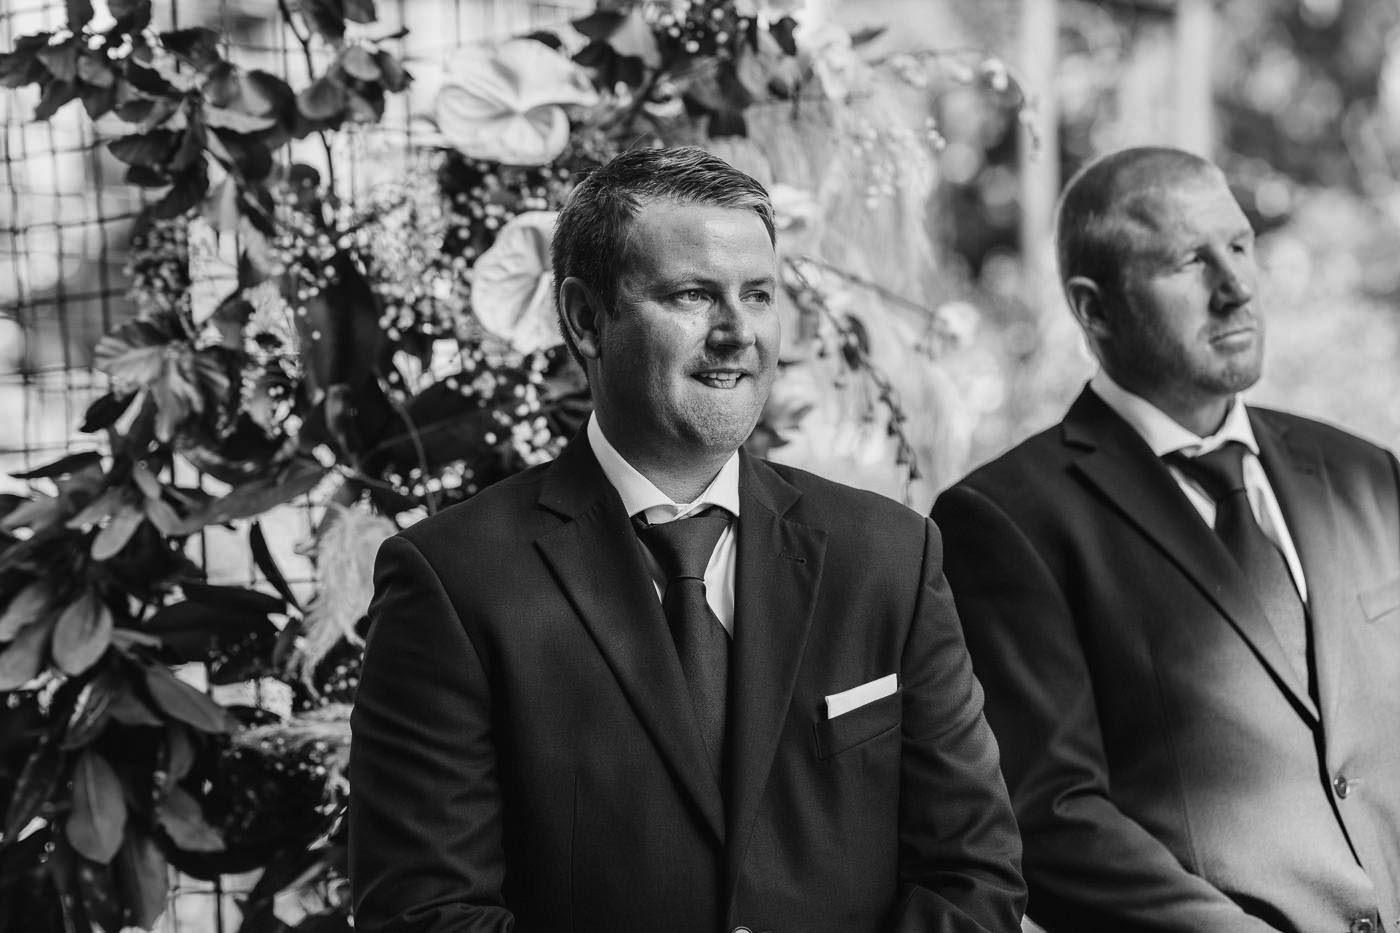 wedding_photographers_narrows_landing-1050.jpg